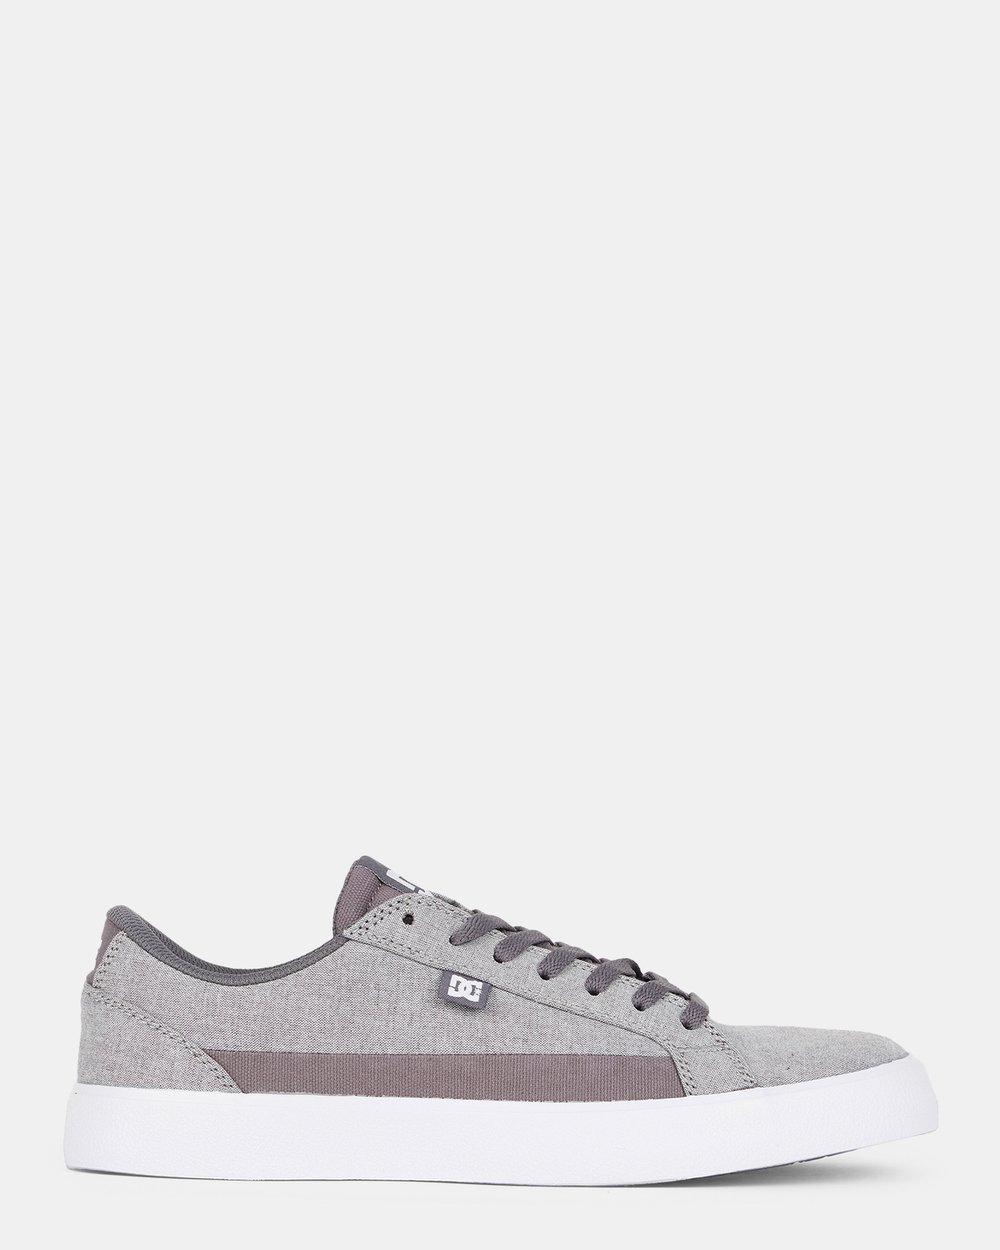 Mens Lynnfield TX SE Shoe by DC Shoes Online  133c99c32af